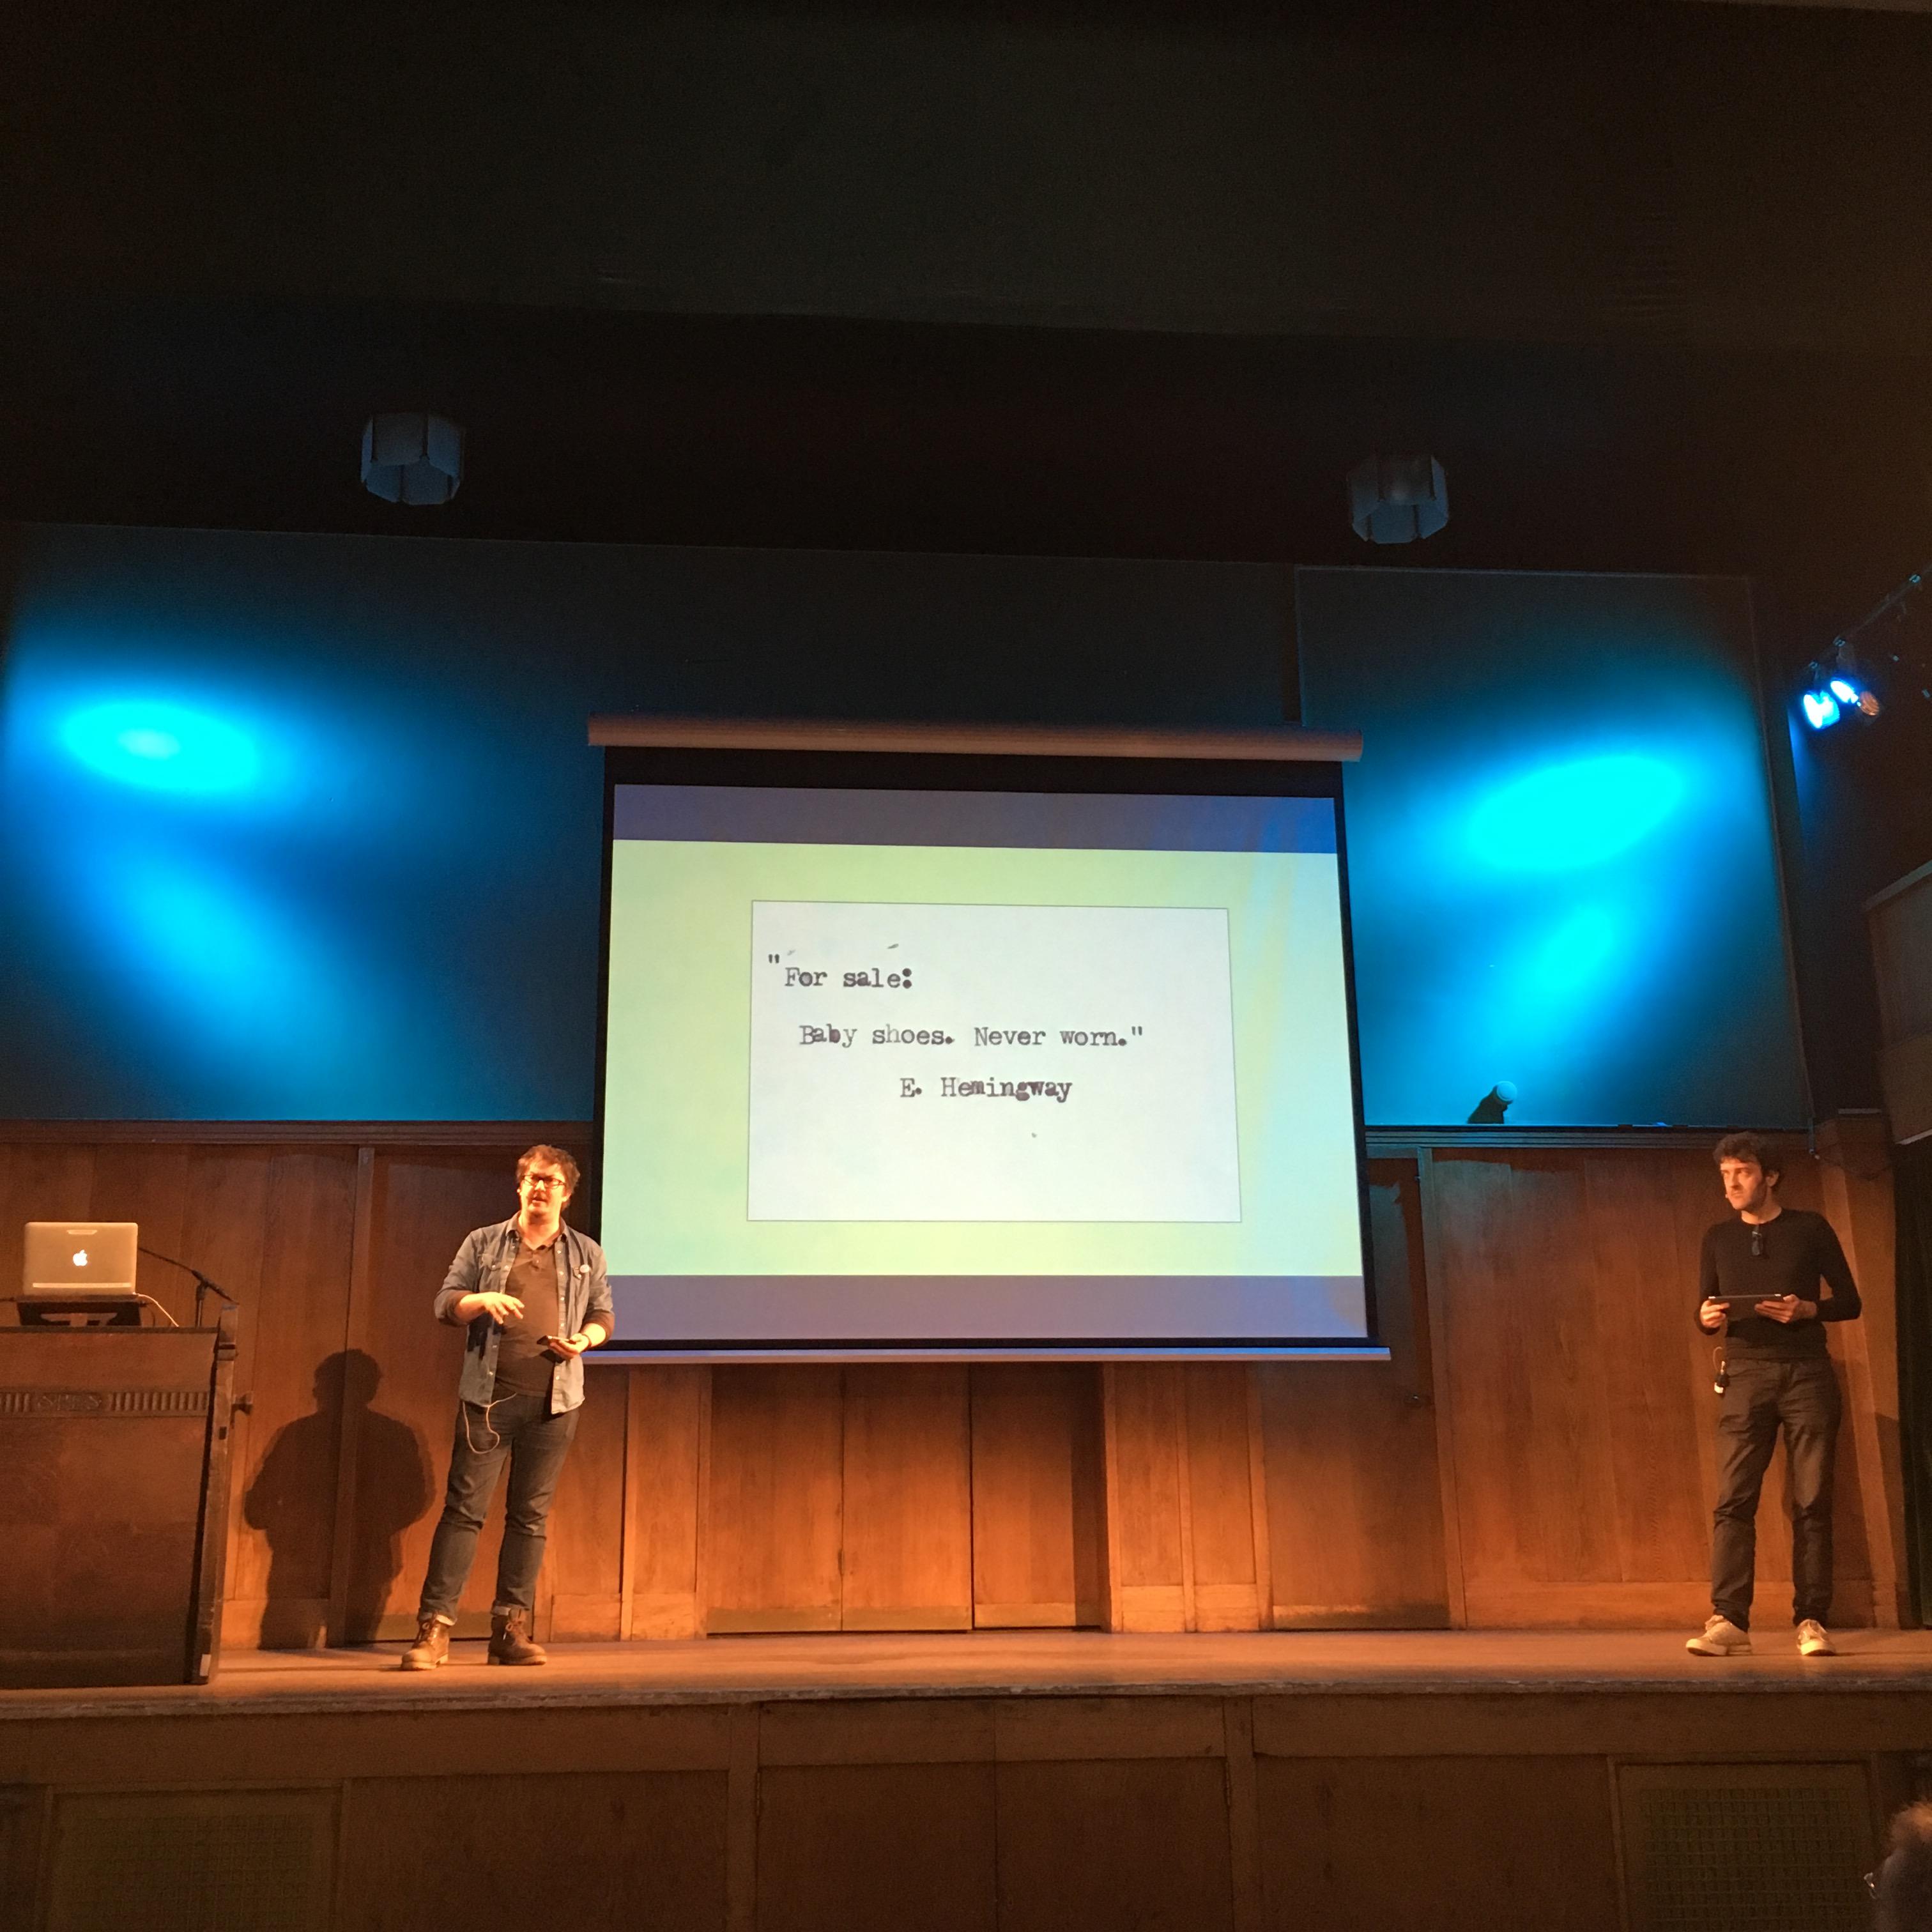 Joel Morris & Jason Hazeley at The Story 2019 conway hall london